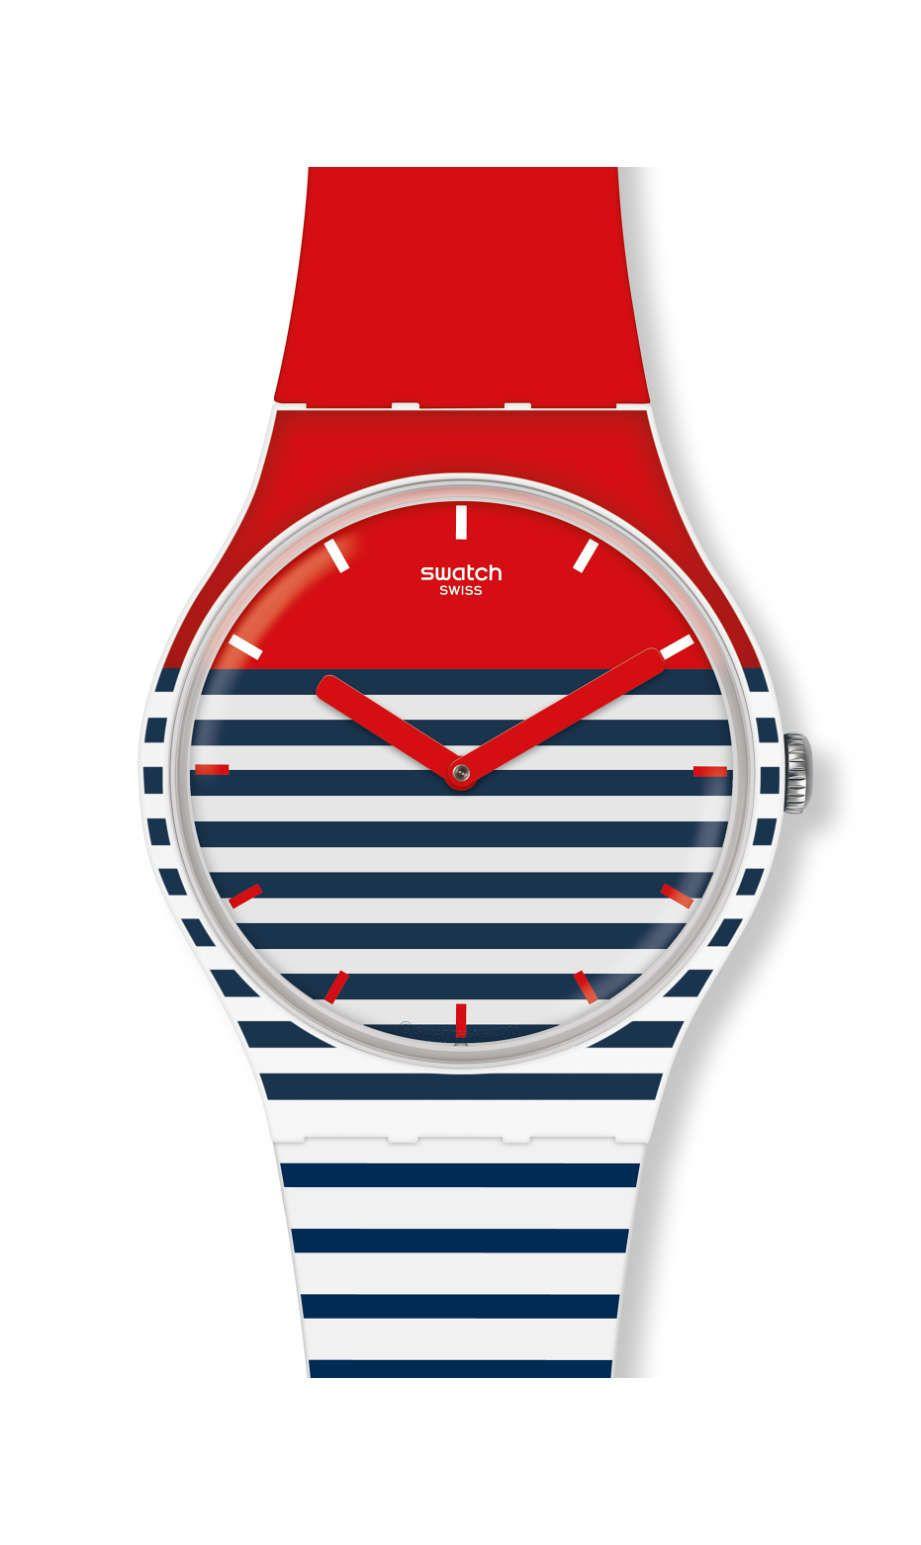 diseño de calidad 27d6a e0c4e Swatch Watch* MAGLIETTA | Swatch España | Relojes | Swatch ...